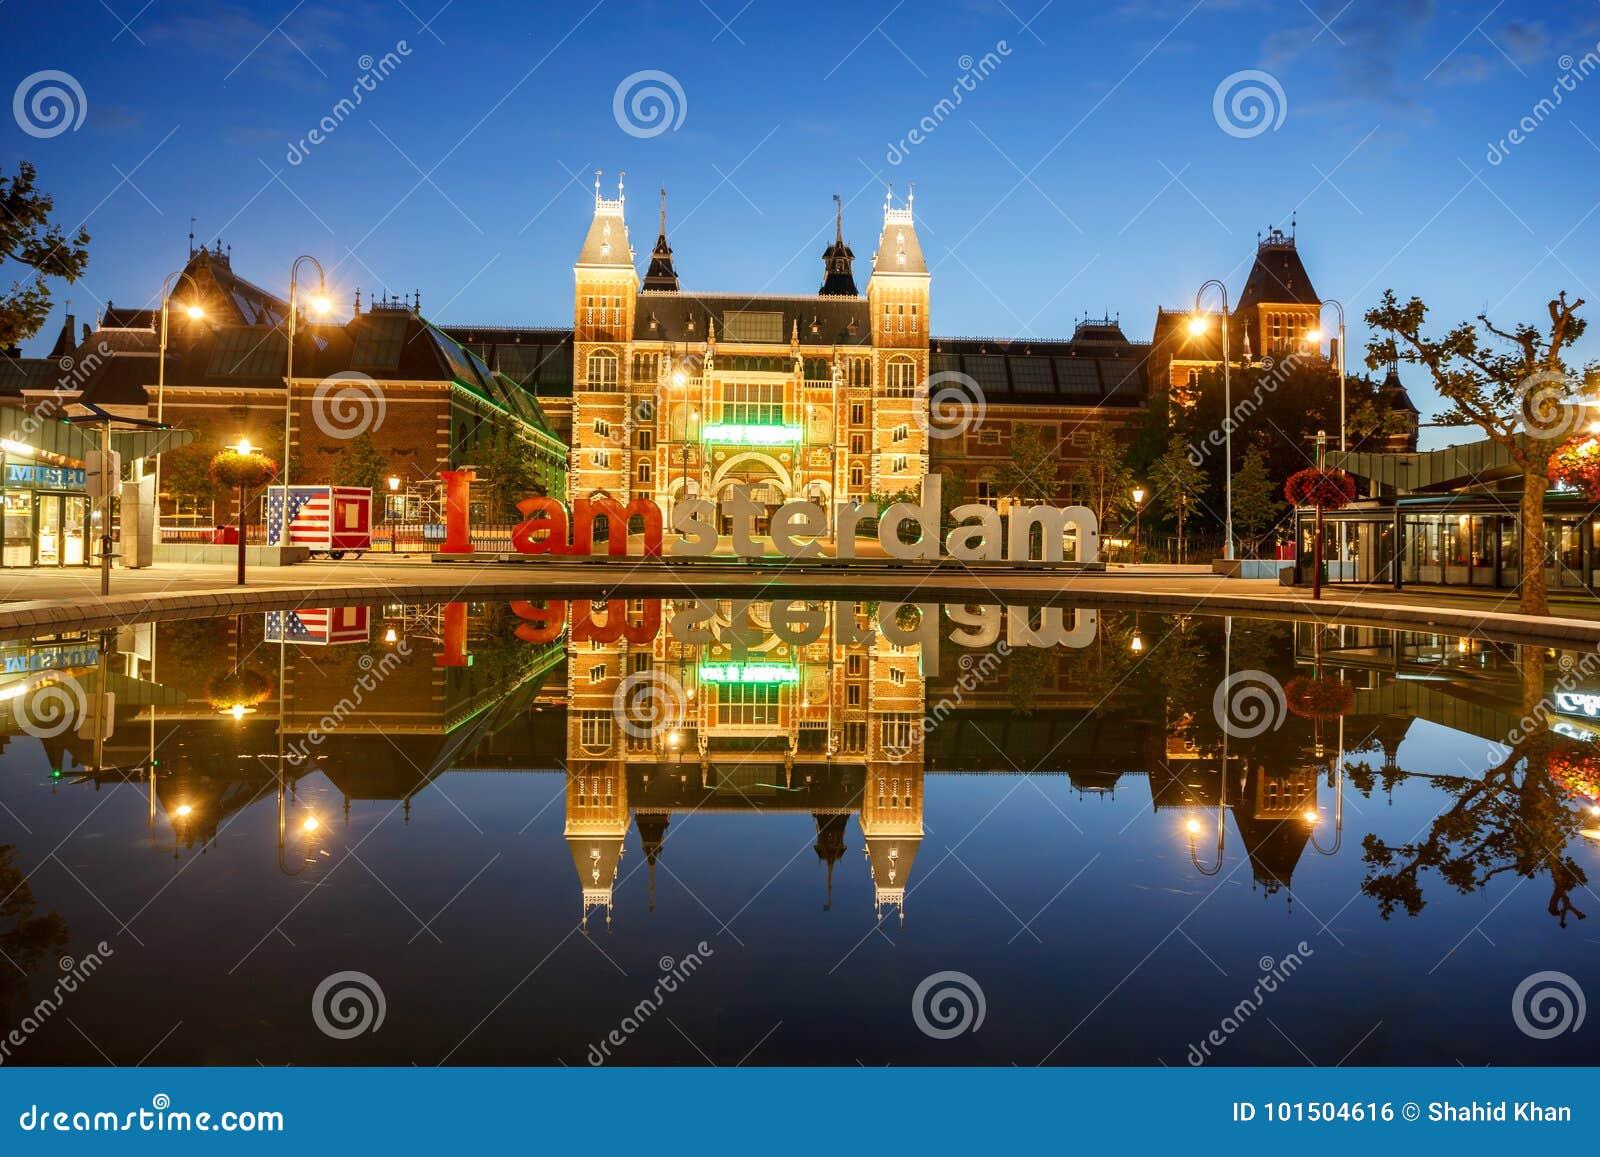 Rijksmuseum Amsterdam Netherland